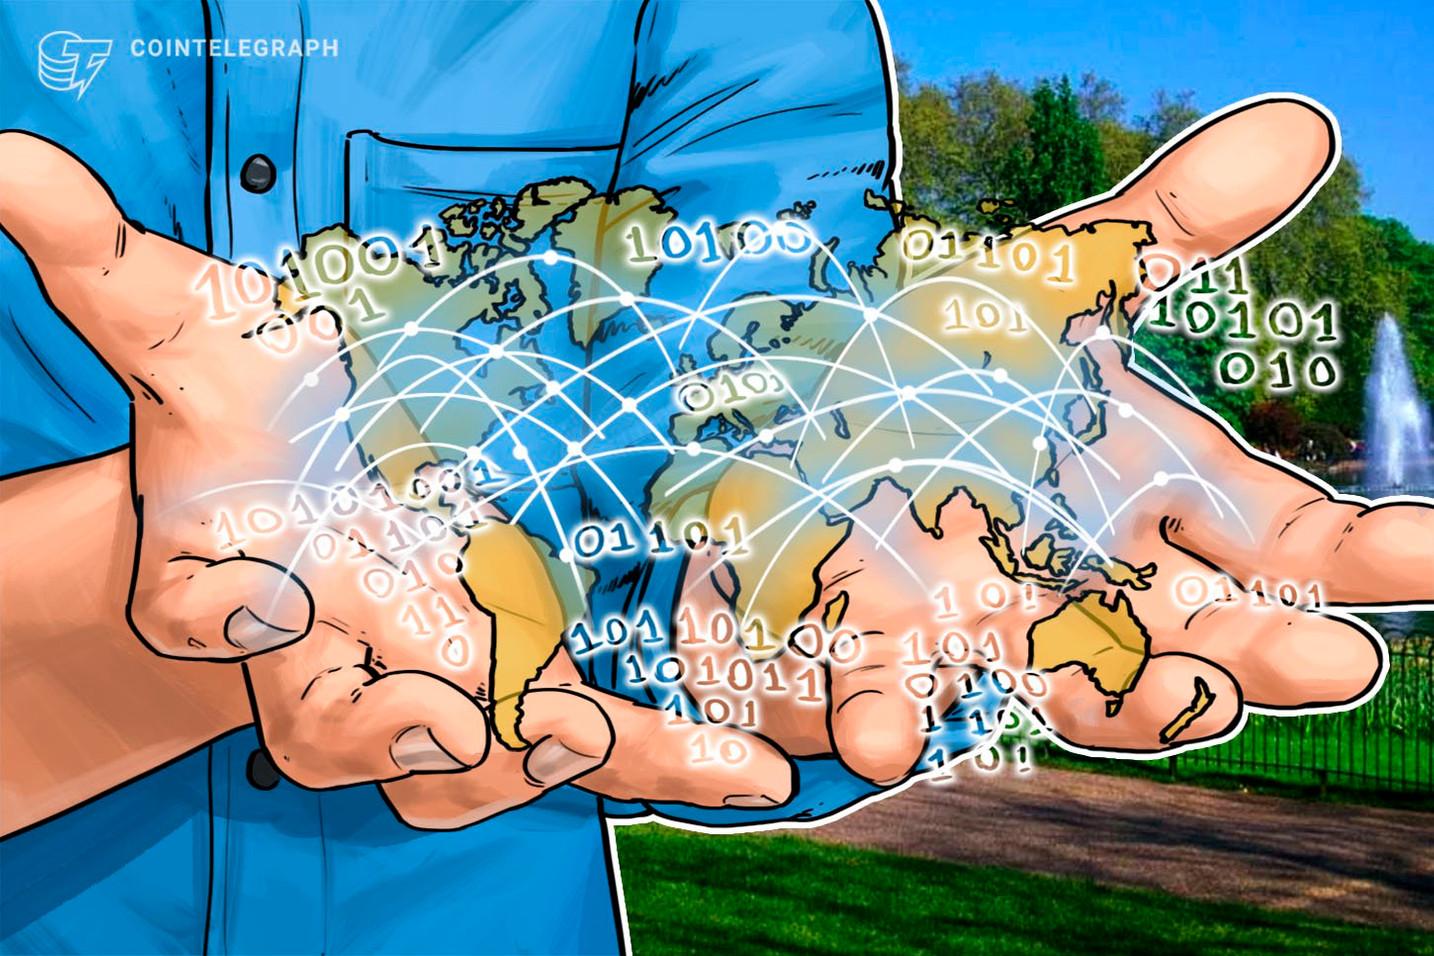 Enterprise Blockchain Platform Records 10K Transactions per Second in Testnet Launch